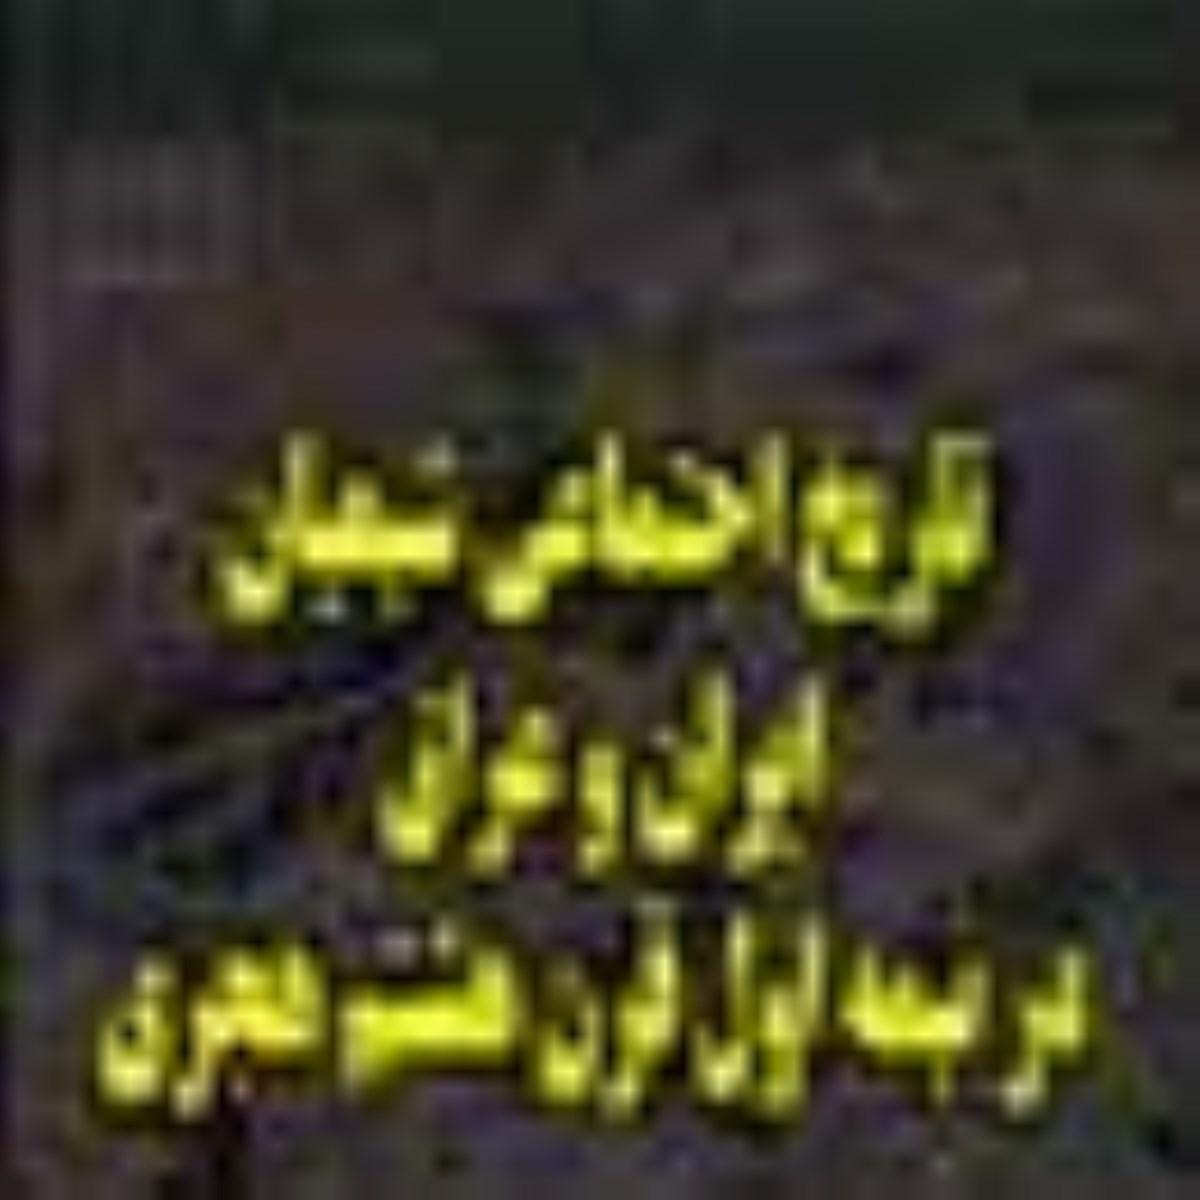 تاريخ اجتماعى شيعيان ايران و عراق در نيمه اول قرن هشتم هجرى